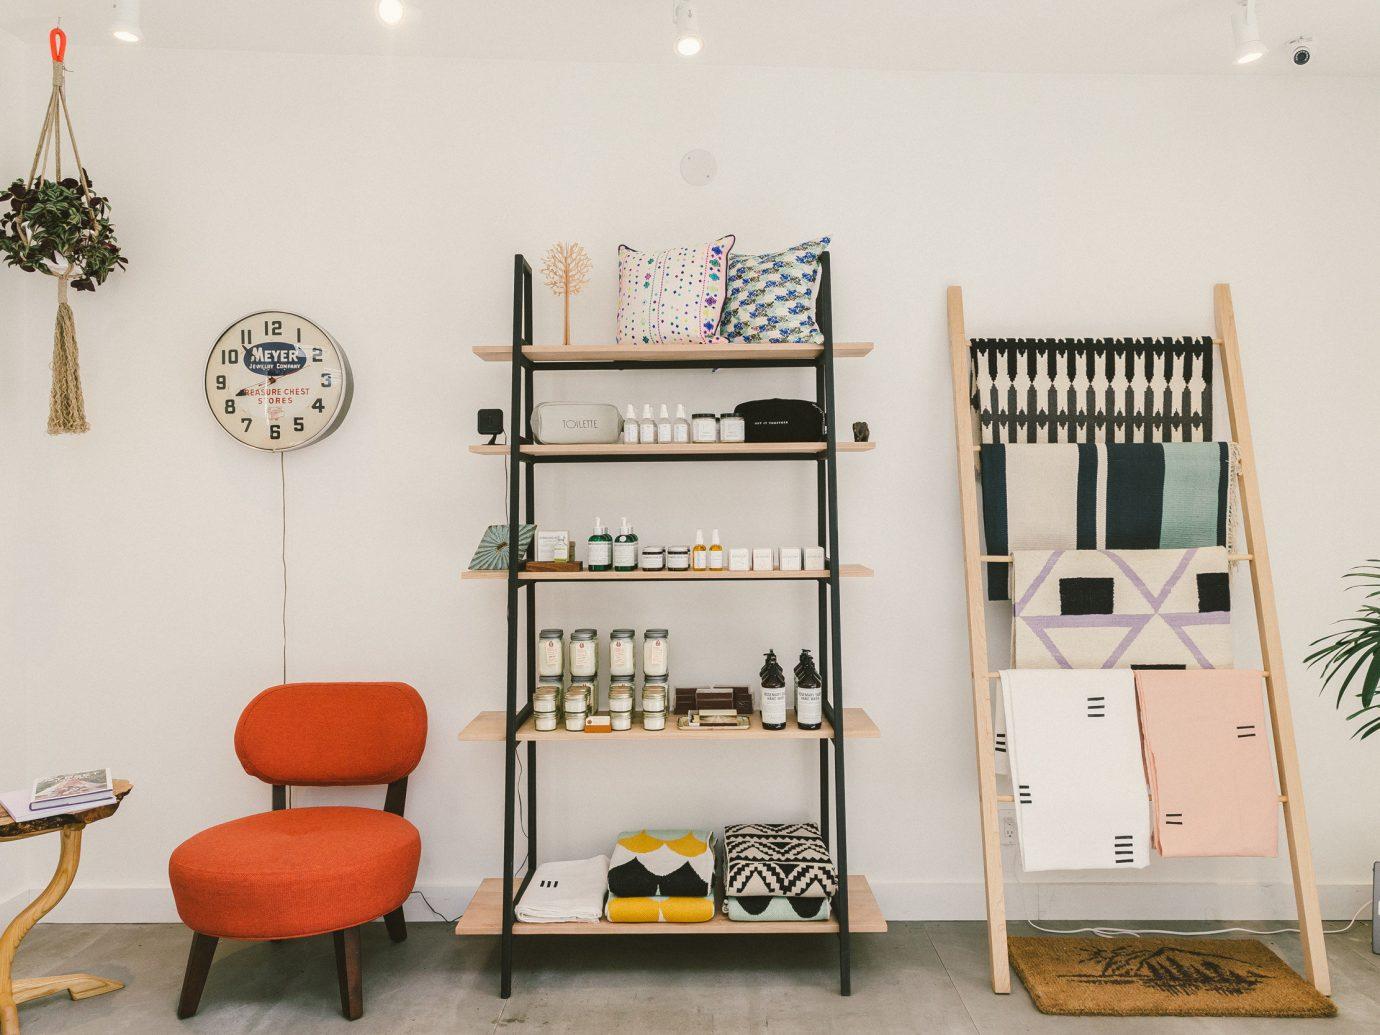 City Trip Ideas Weekend Getaways wall indoor floor room furniture shelving shelf Living interior design product design product table area